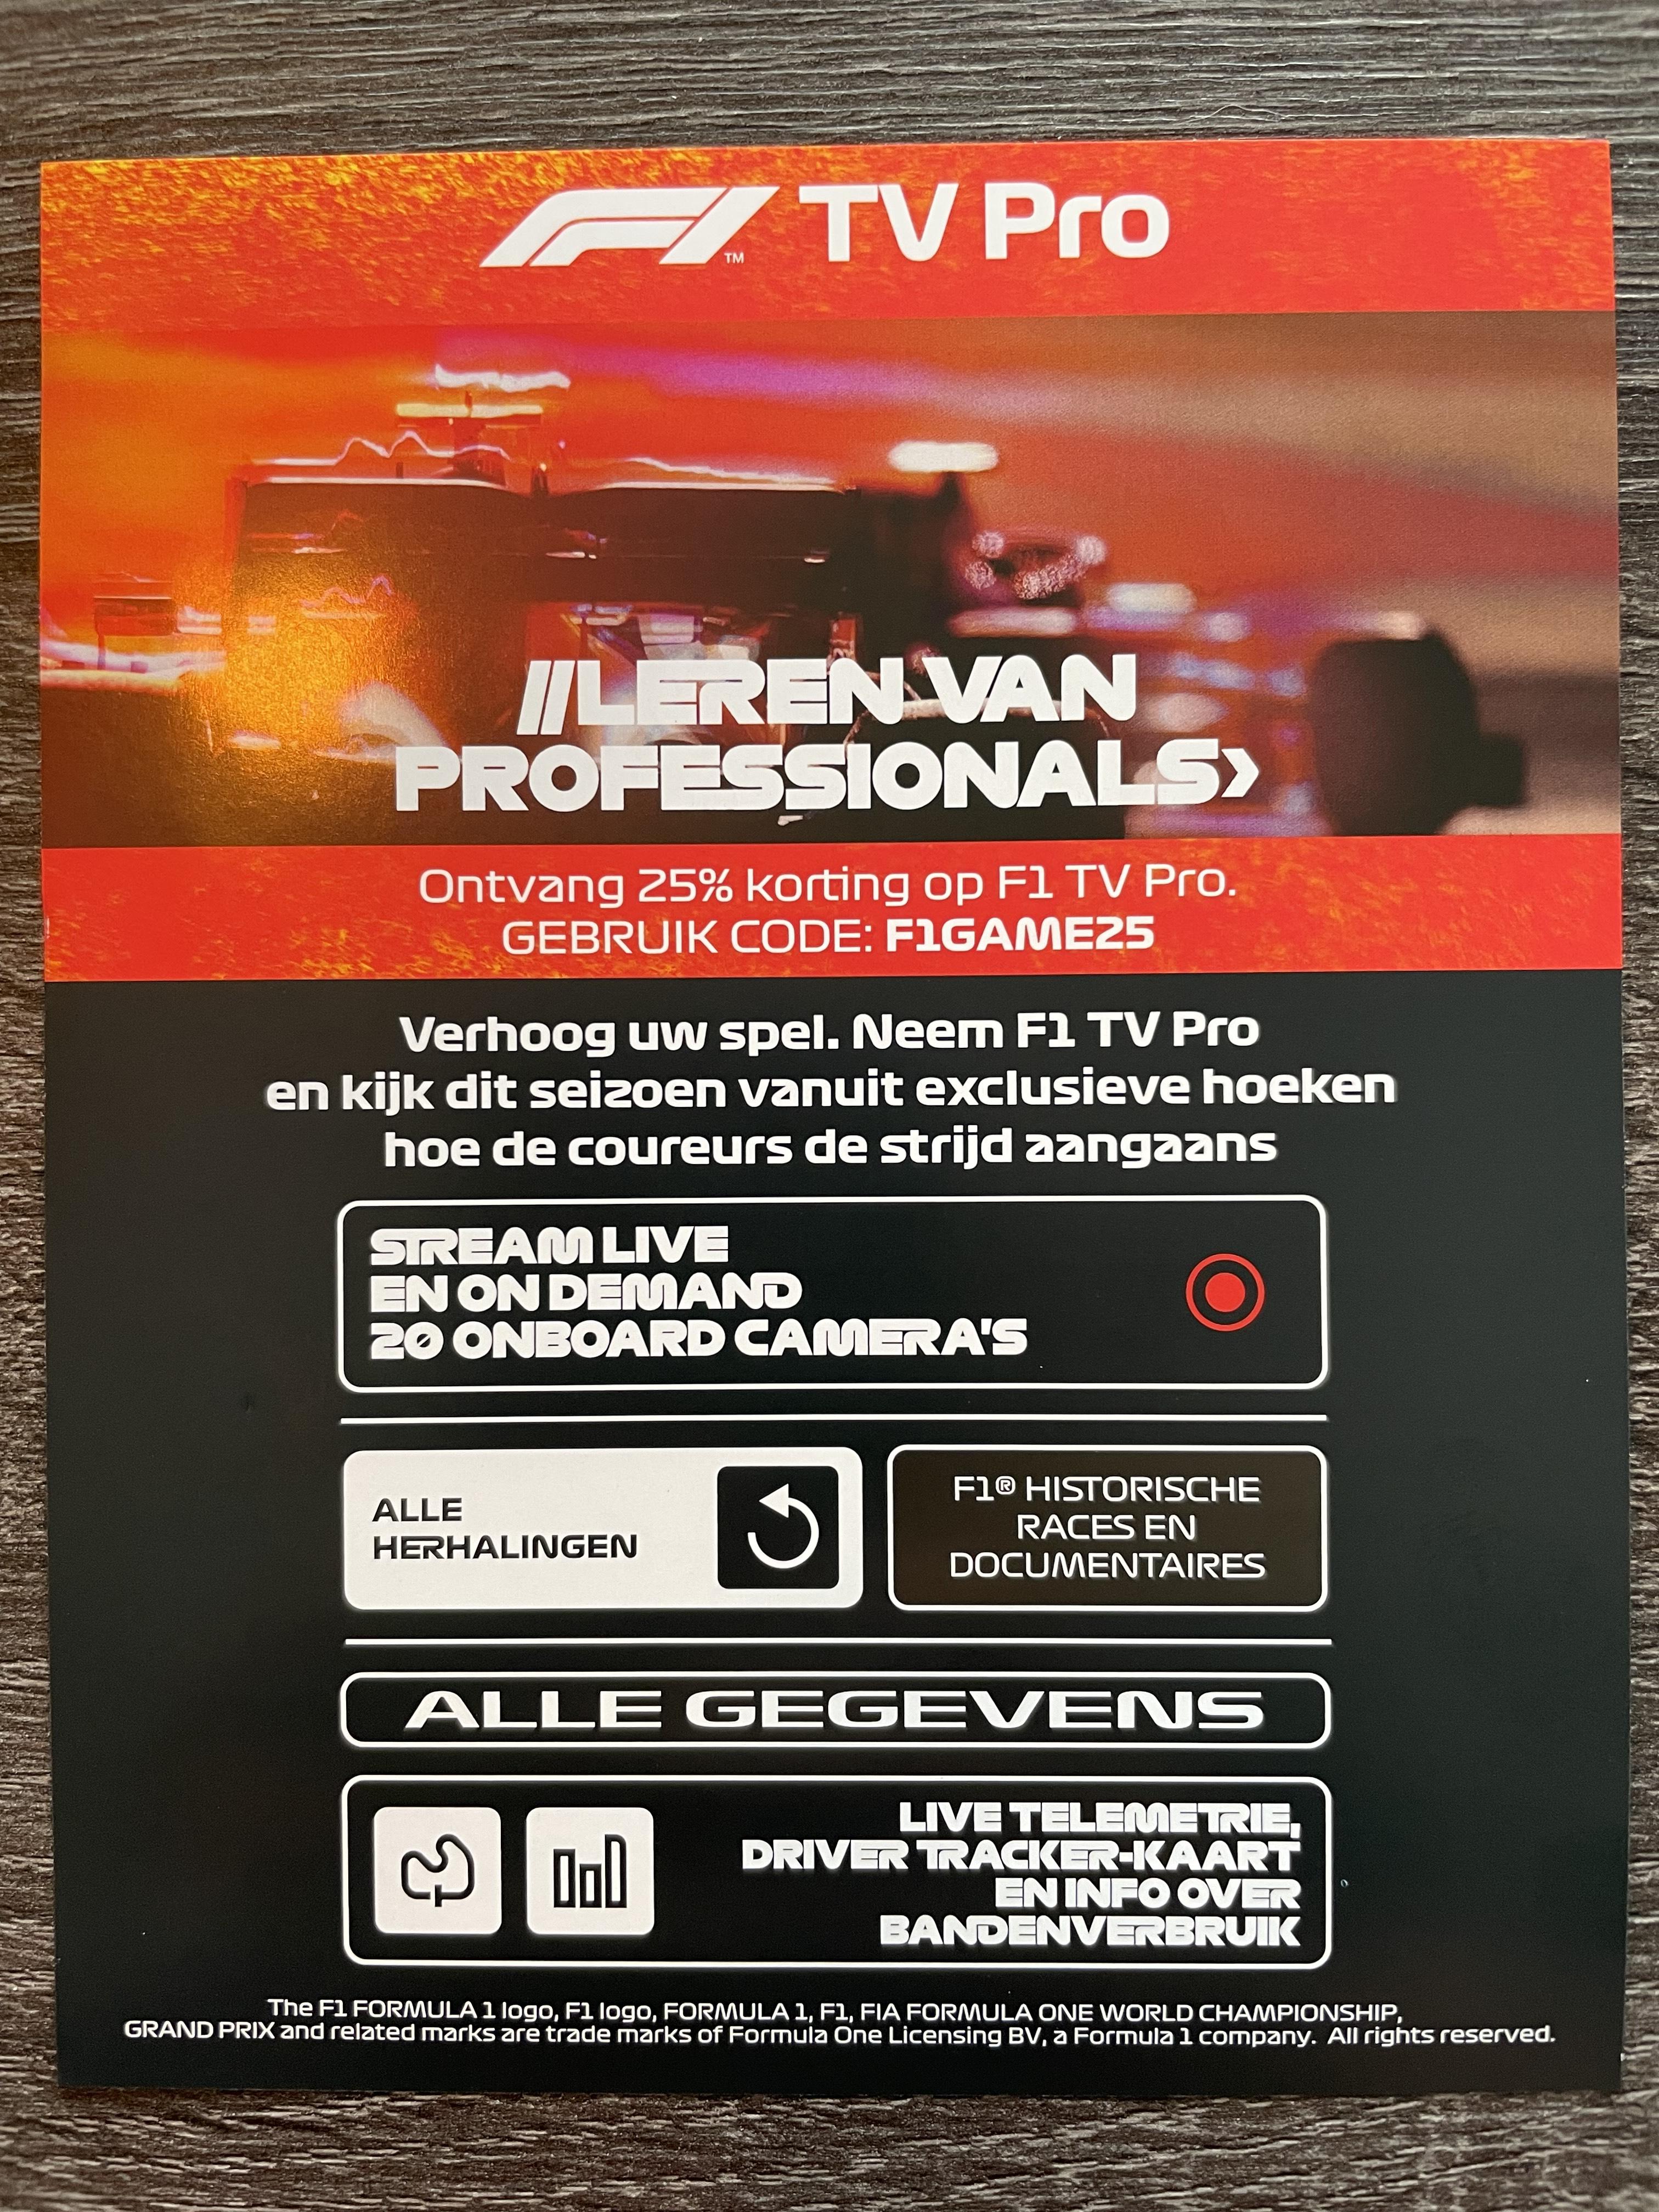 25% korting op F1 TV Pro